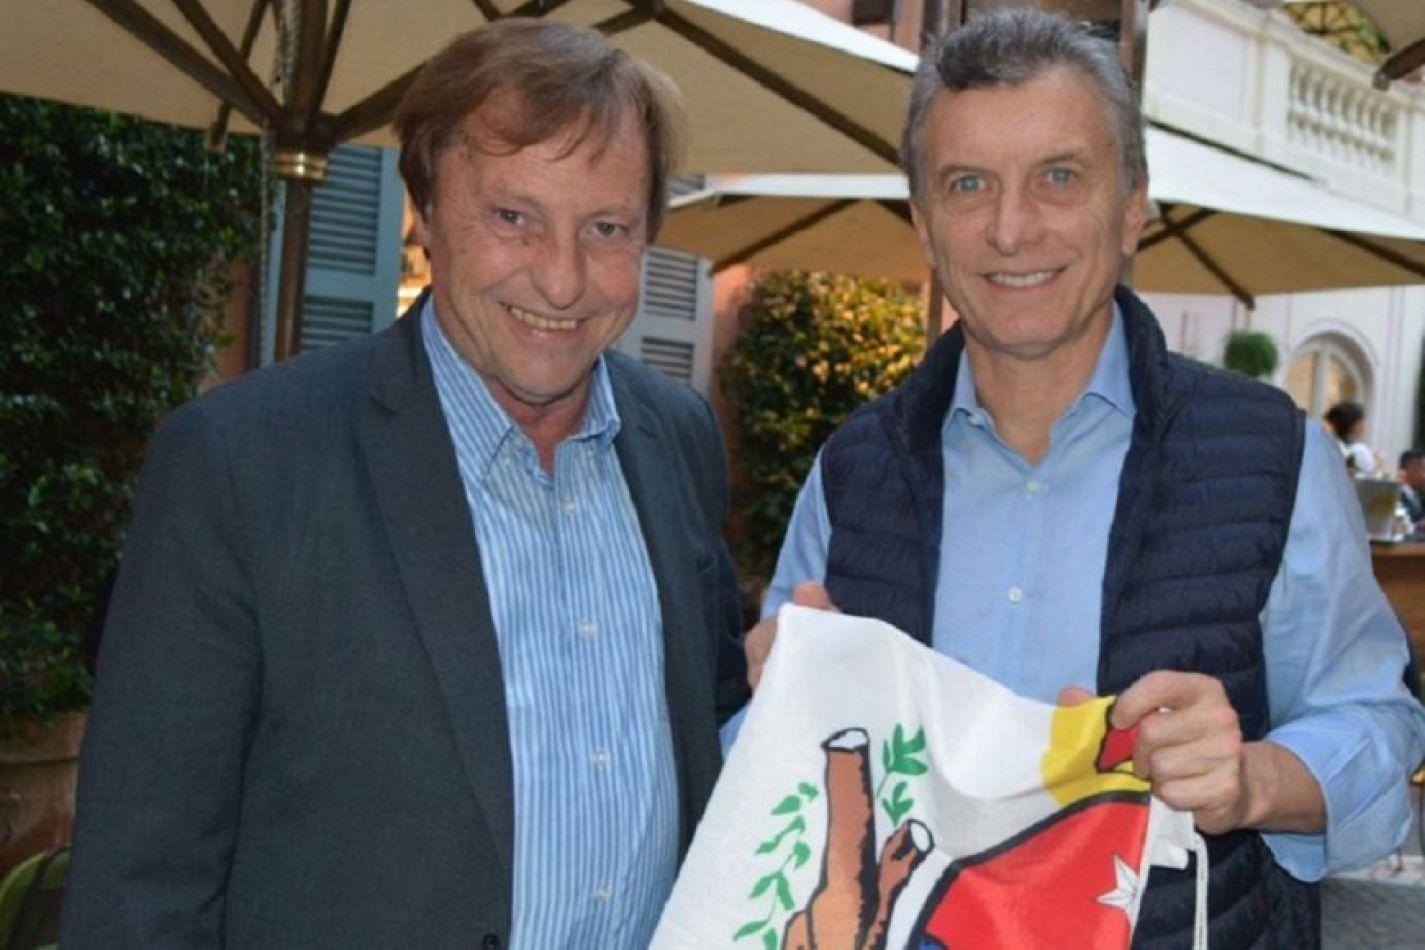 Foto: elentrerios.com. Varisco junto al ex presidente Macri